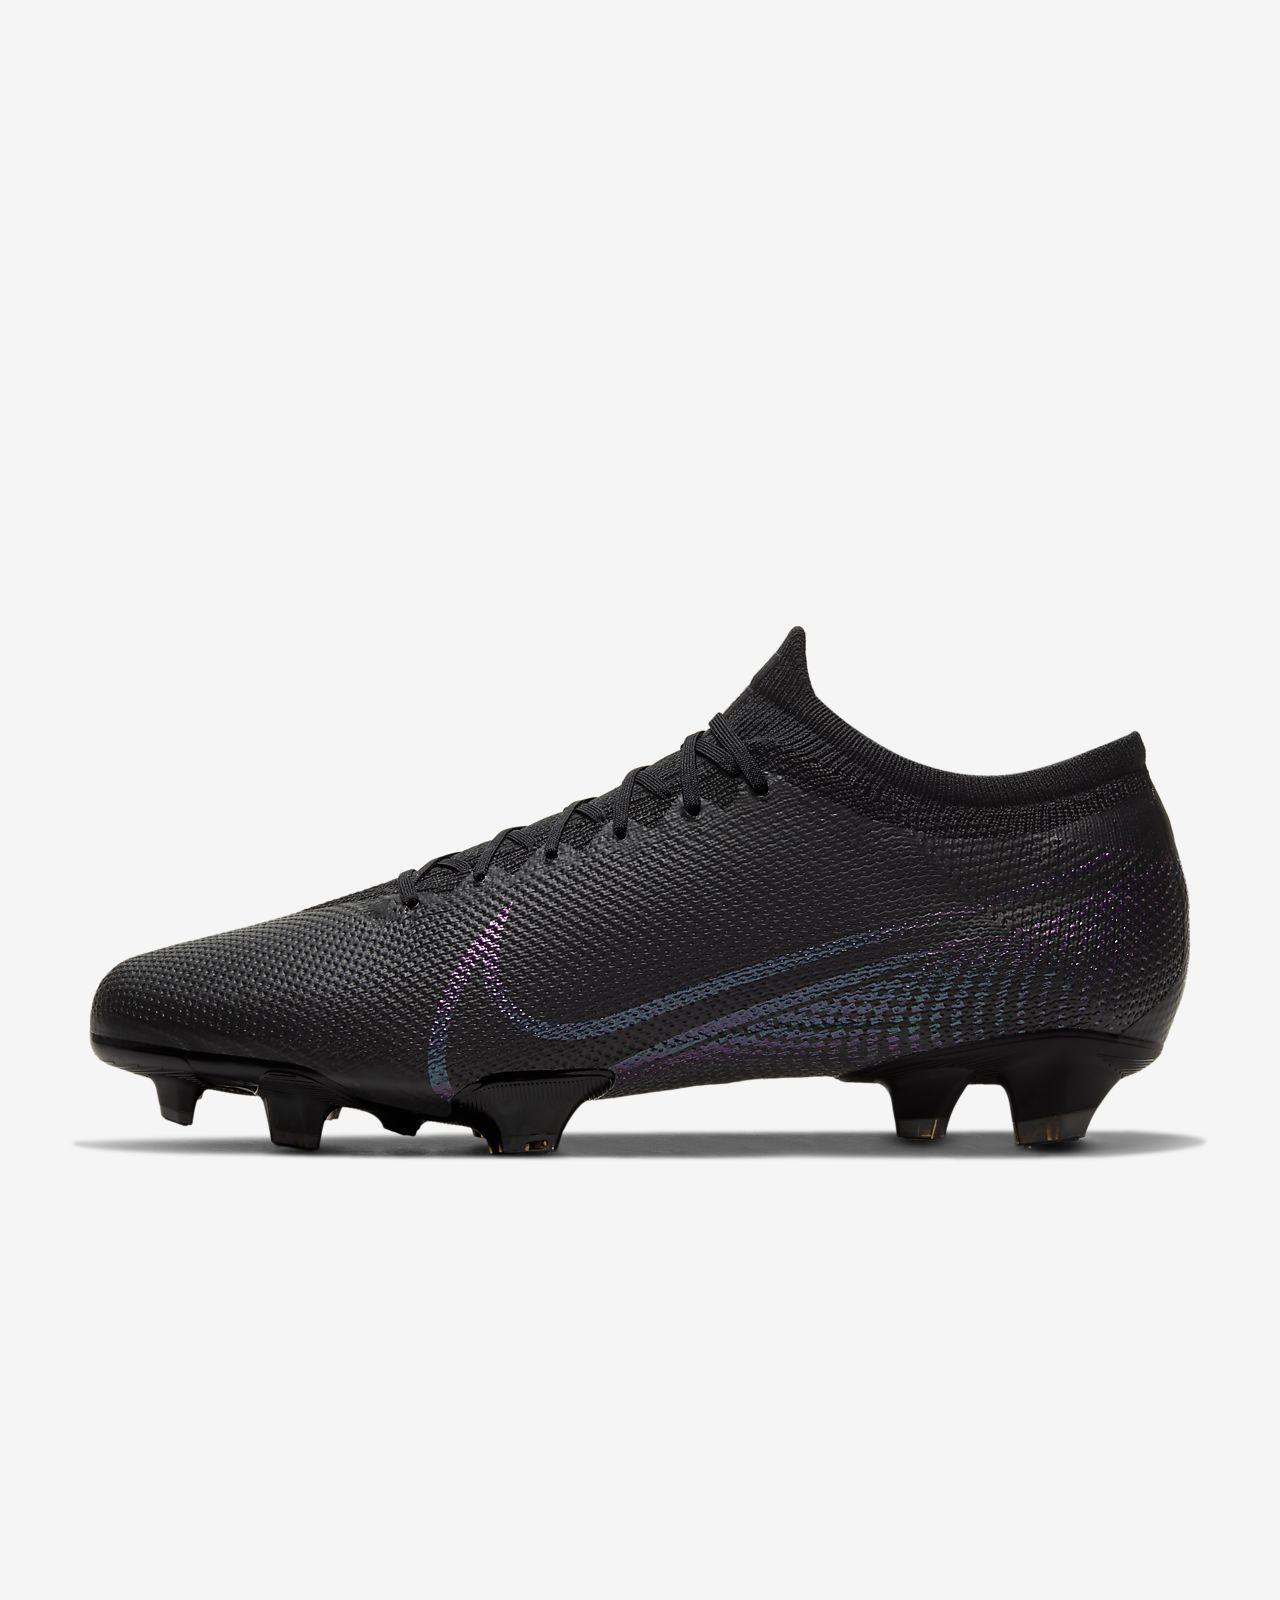 Chuteira Nike Mercurial Vapor 12 Pró Neymar Jr. SG – Loja